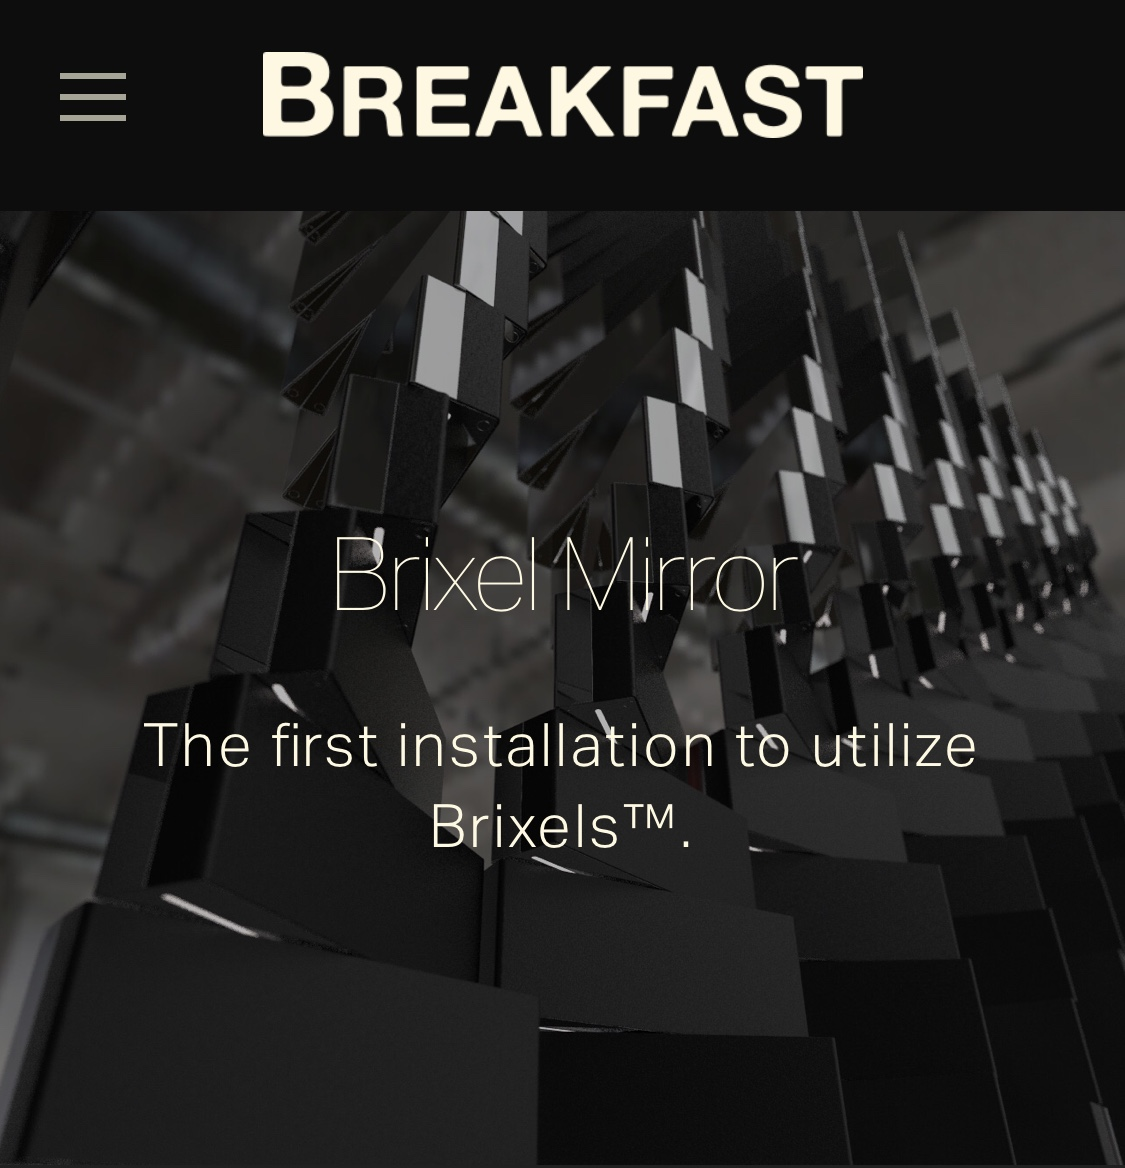 Brixel Mirror